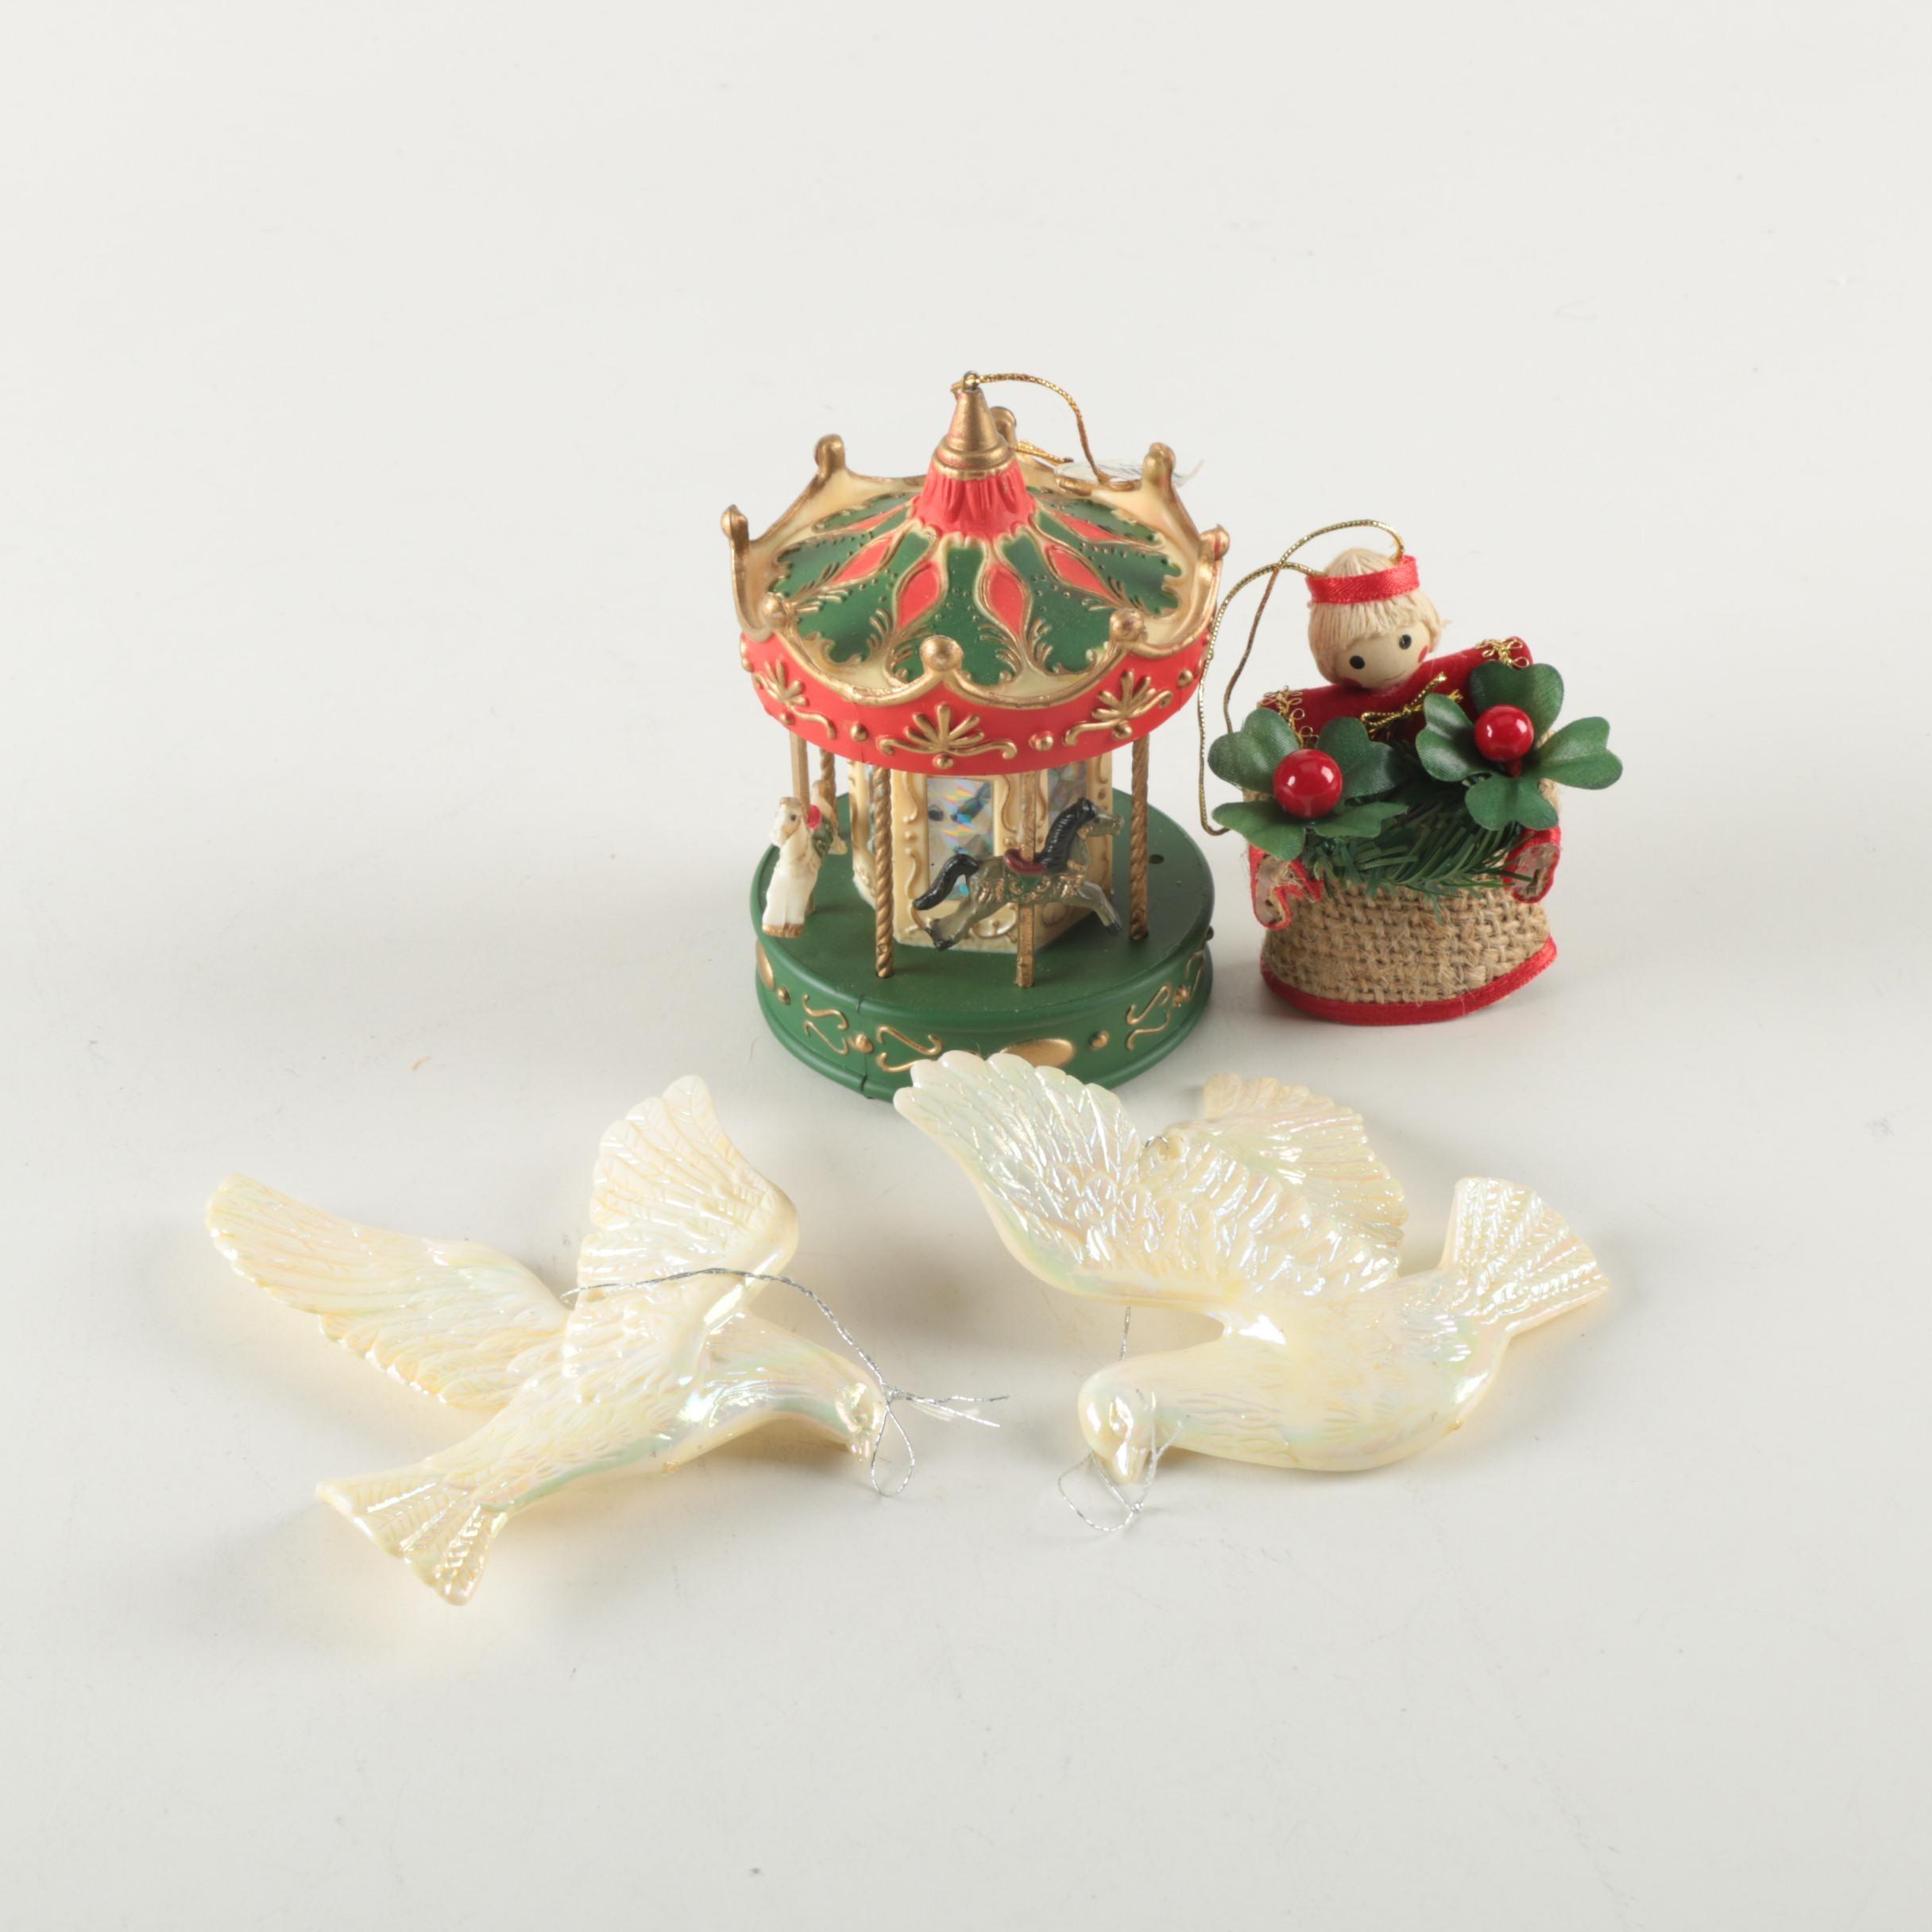 Seasonal Decorative Ornaments